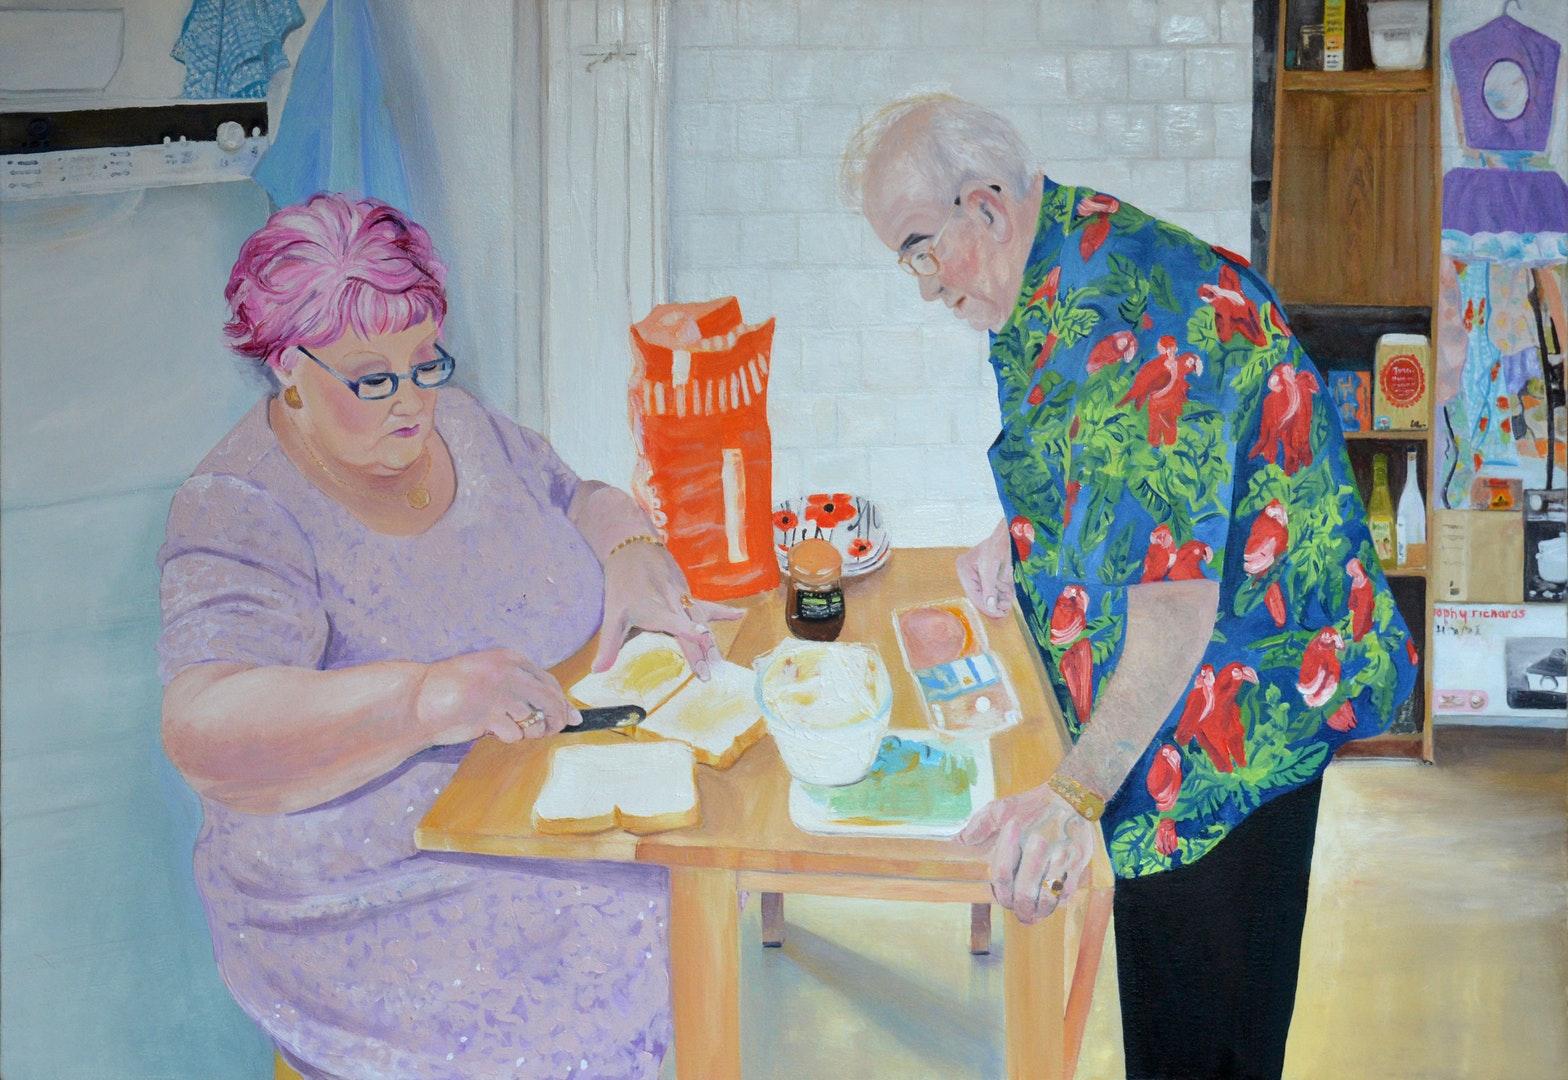 Louise Allen  Ron and Penny Jones  Oil on canvas, 90 x 60 cm  http://www.louise-allen.com/